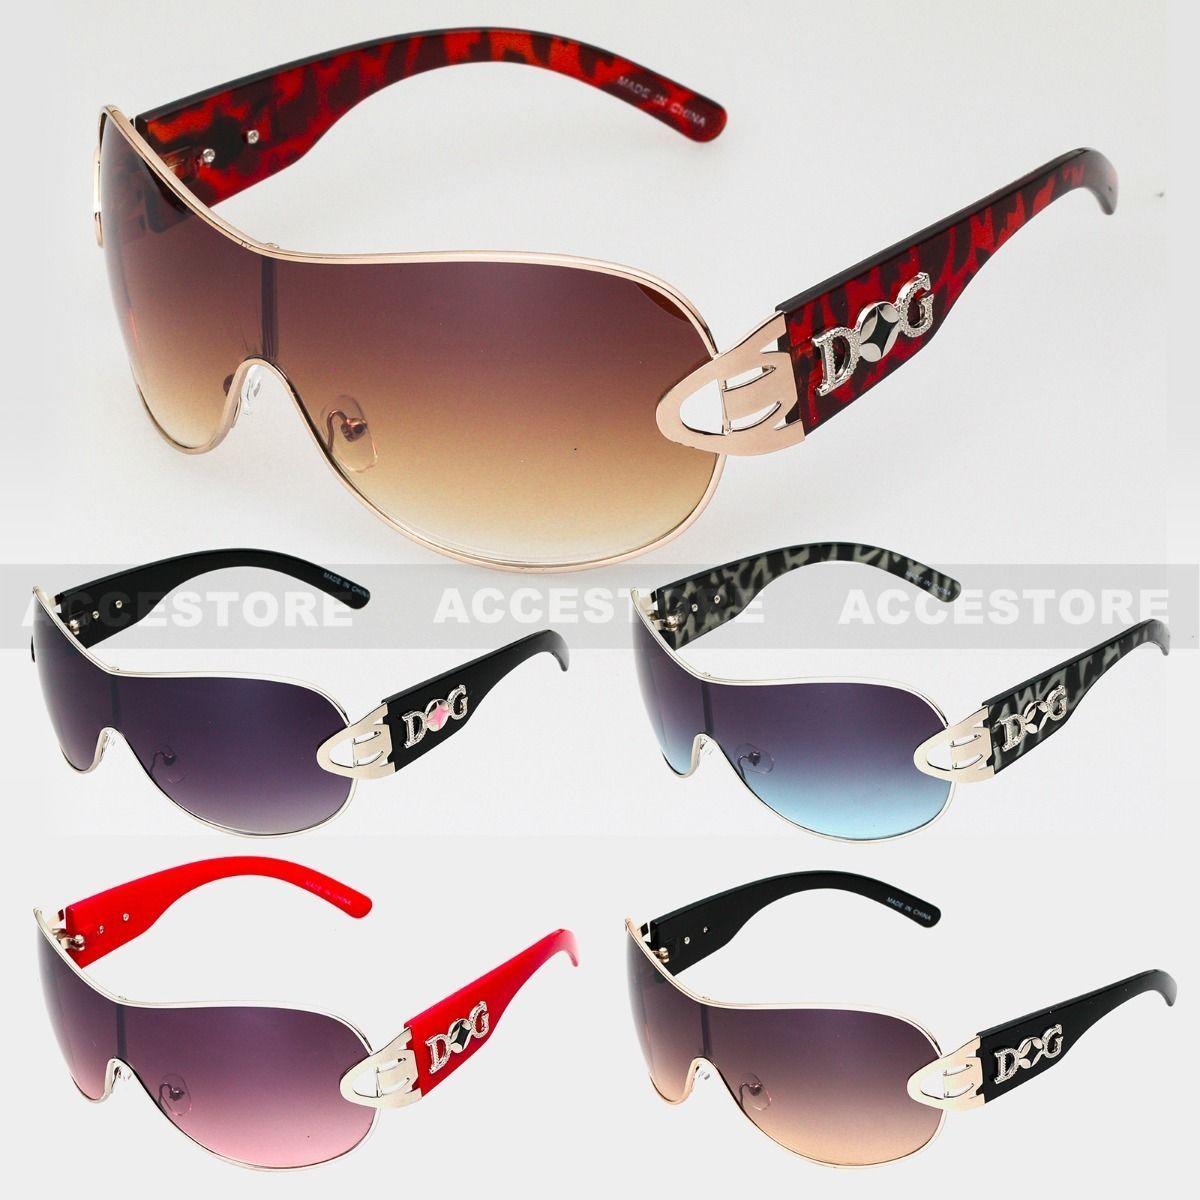 DG Eyewear Celebrity Inspired Vintage Womens Sunglasses